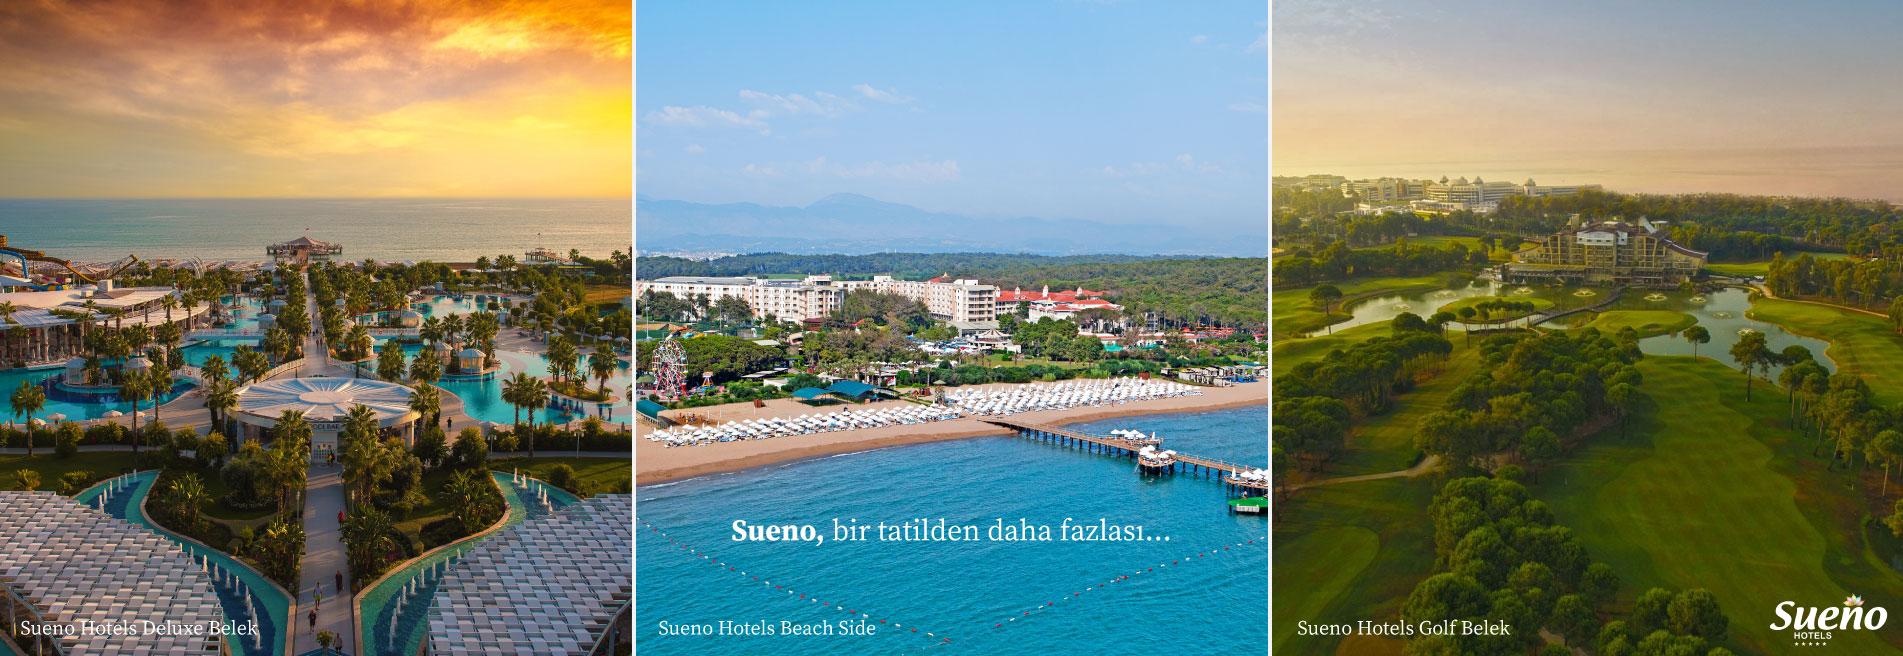 Sueno Otelleri